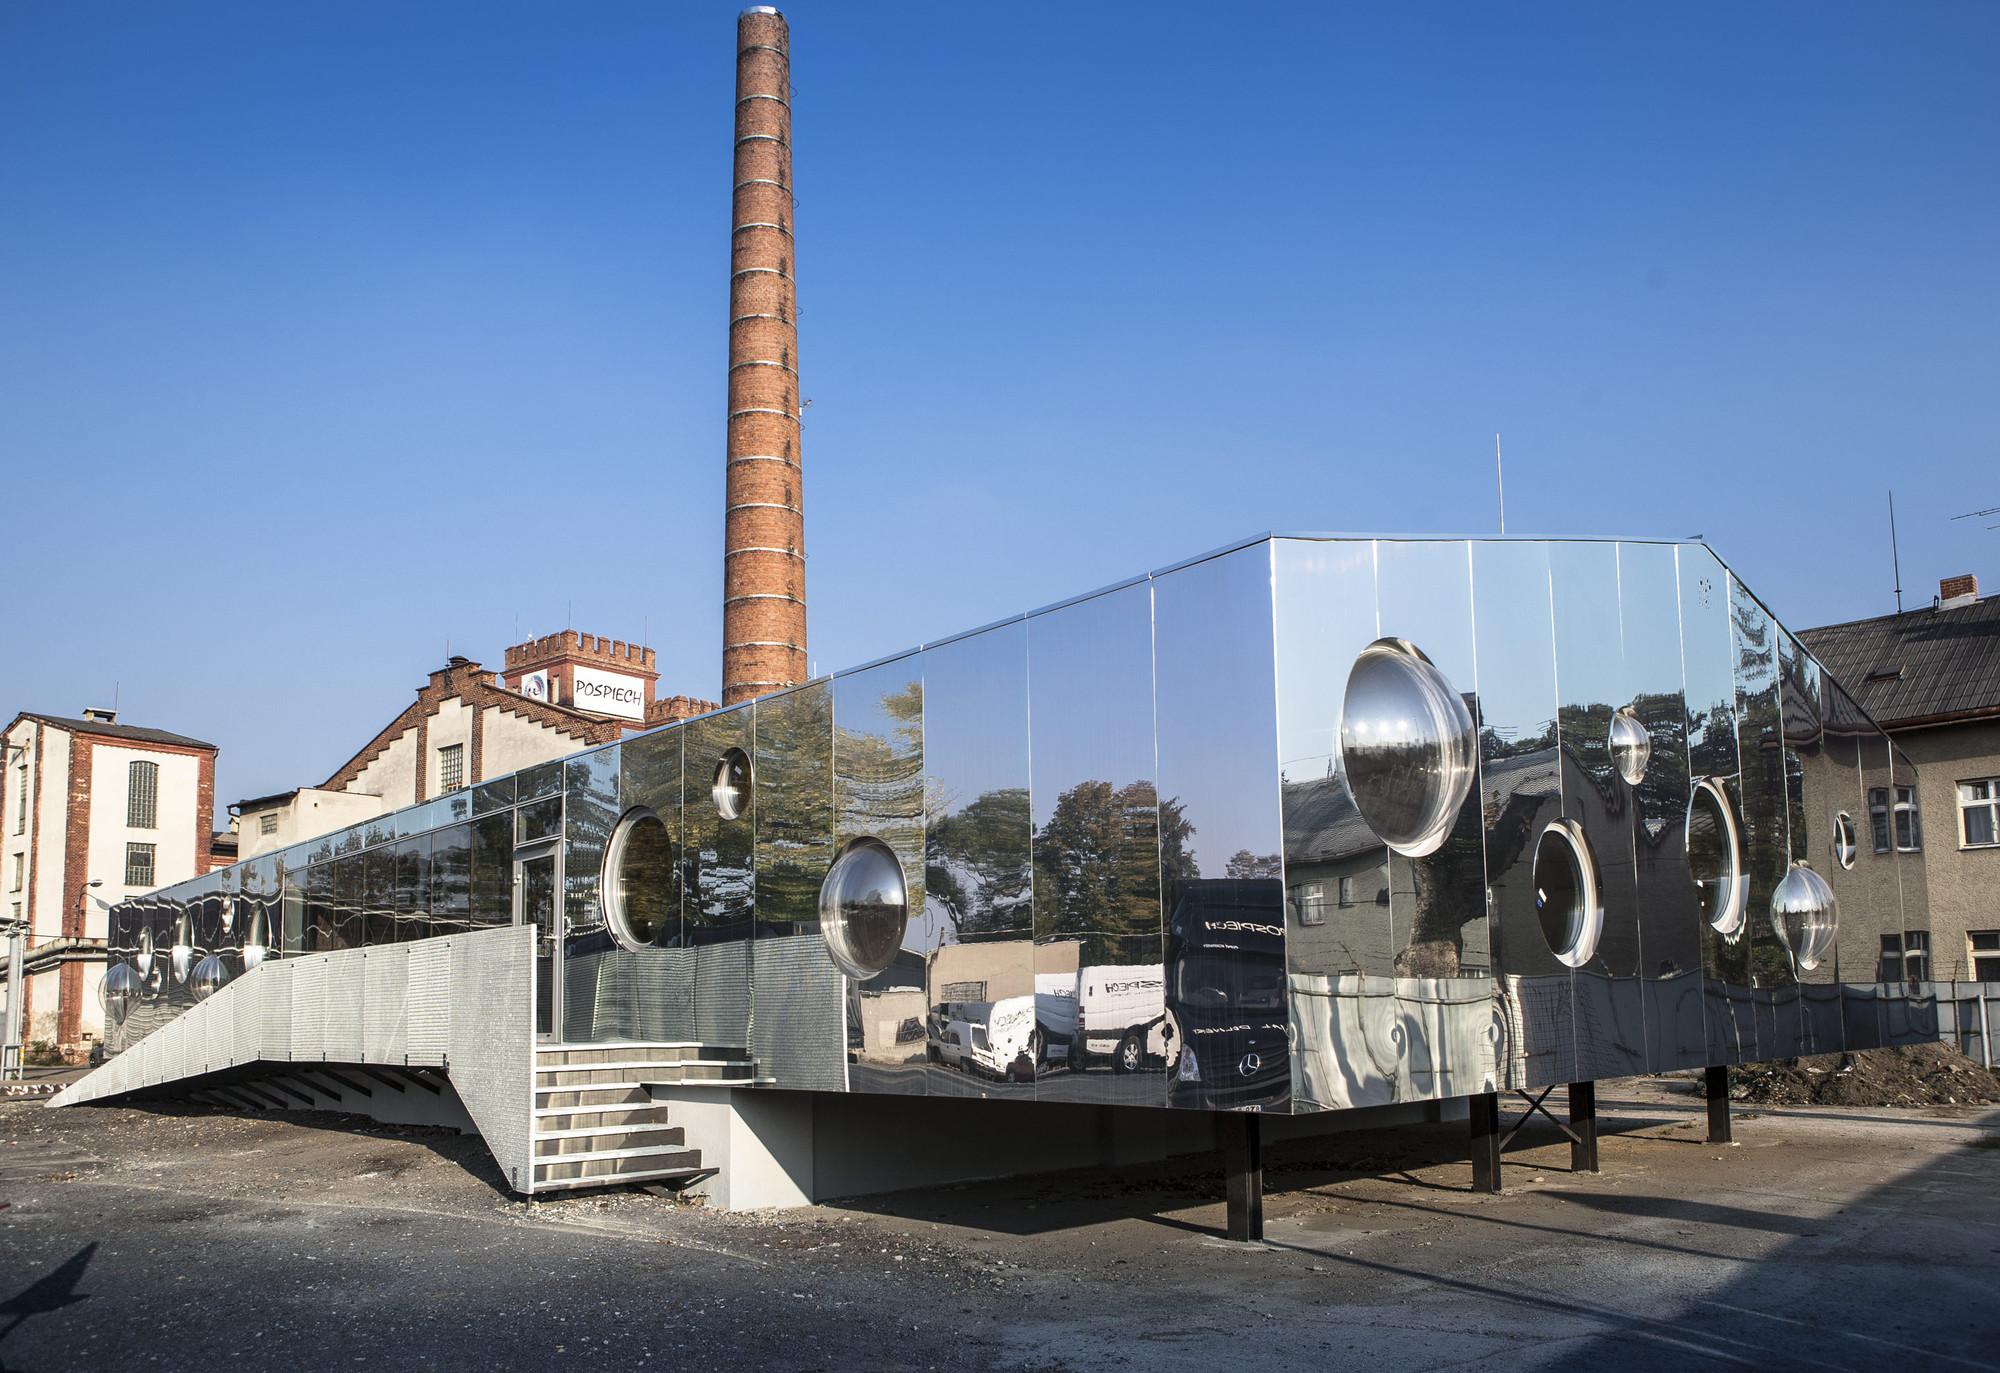 Reconstruction of Building Ostrava-Svinov / PROJEKTSTUDIO, Courtesy of PROJEKTSTUDIO